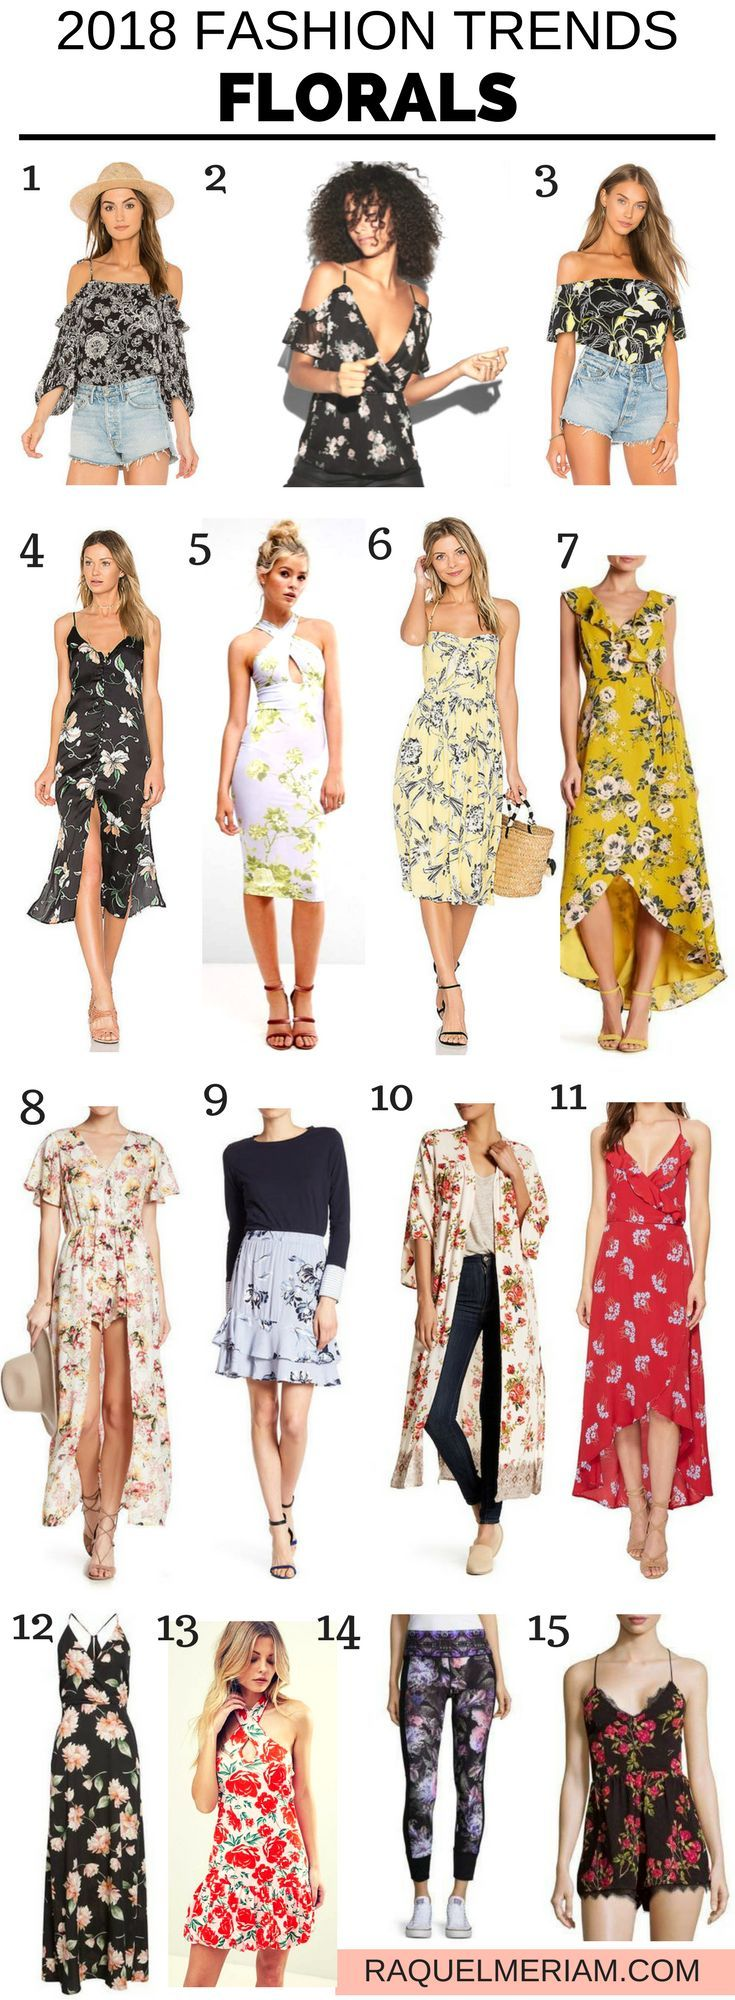 2018 Fashion Trends: Florals #spring #summer #fashiontrends #2018 #workoutfits #florals #dress #skirt #pants